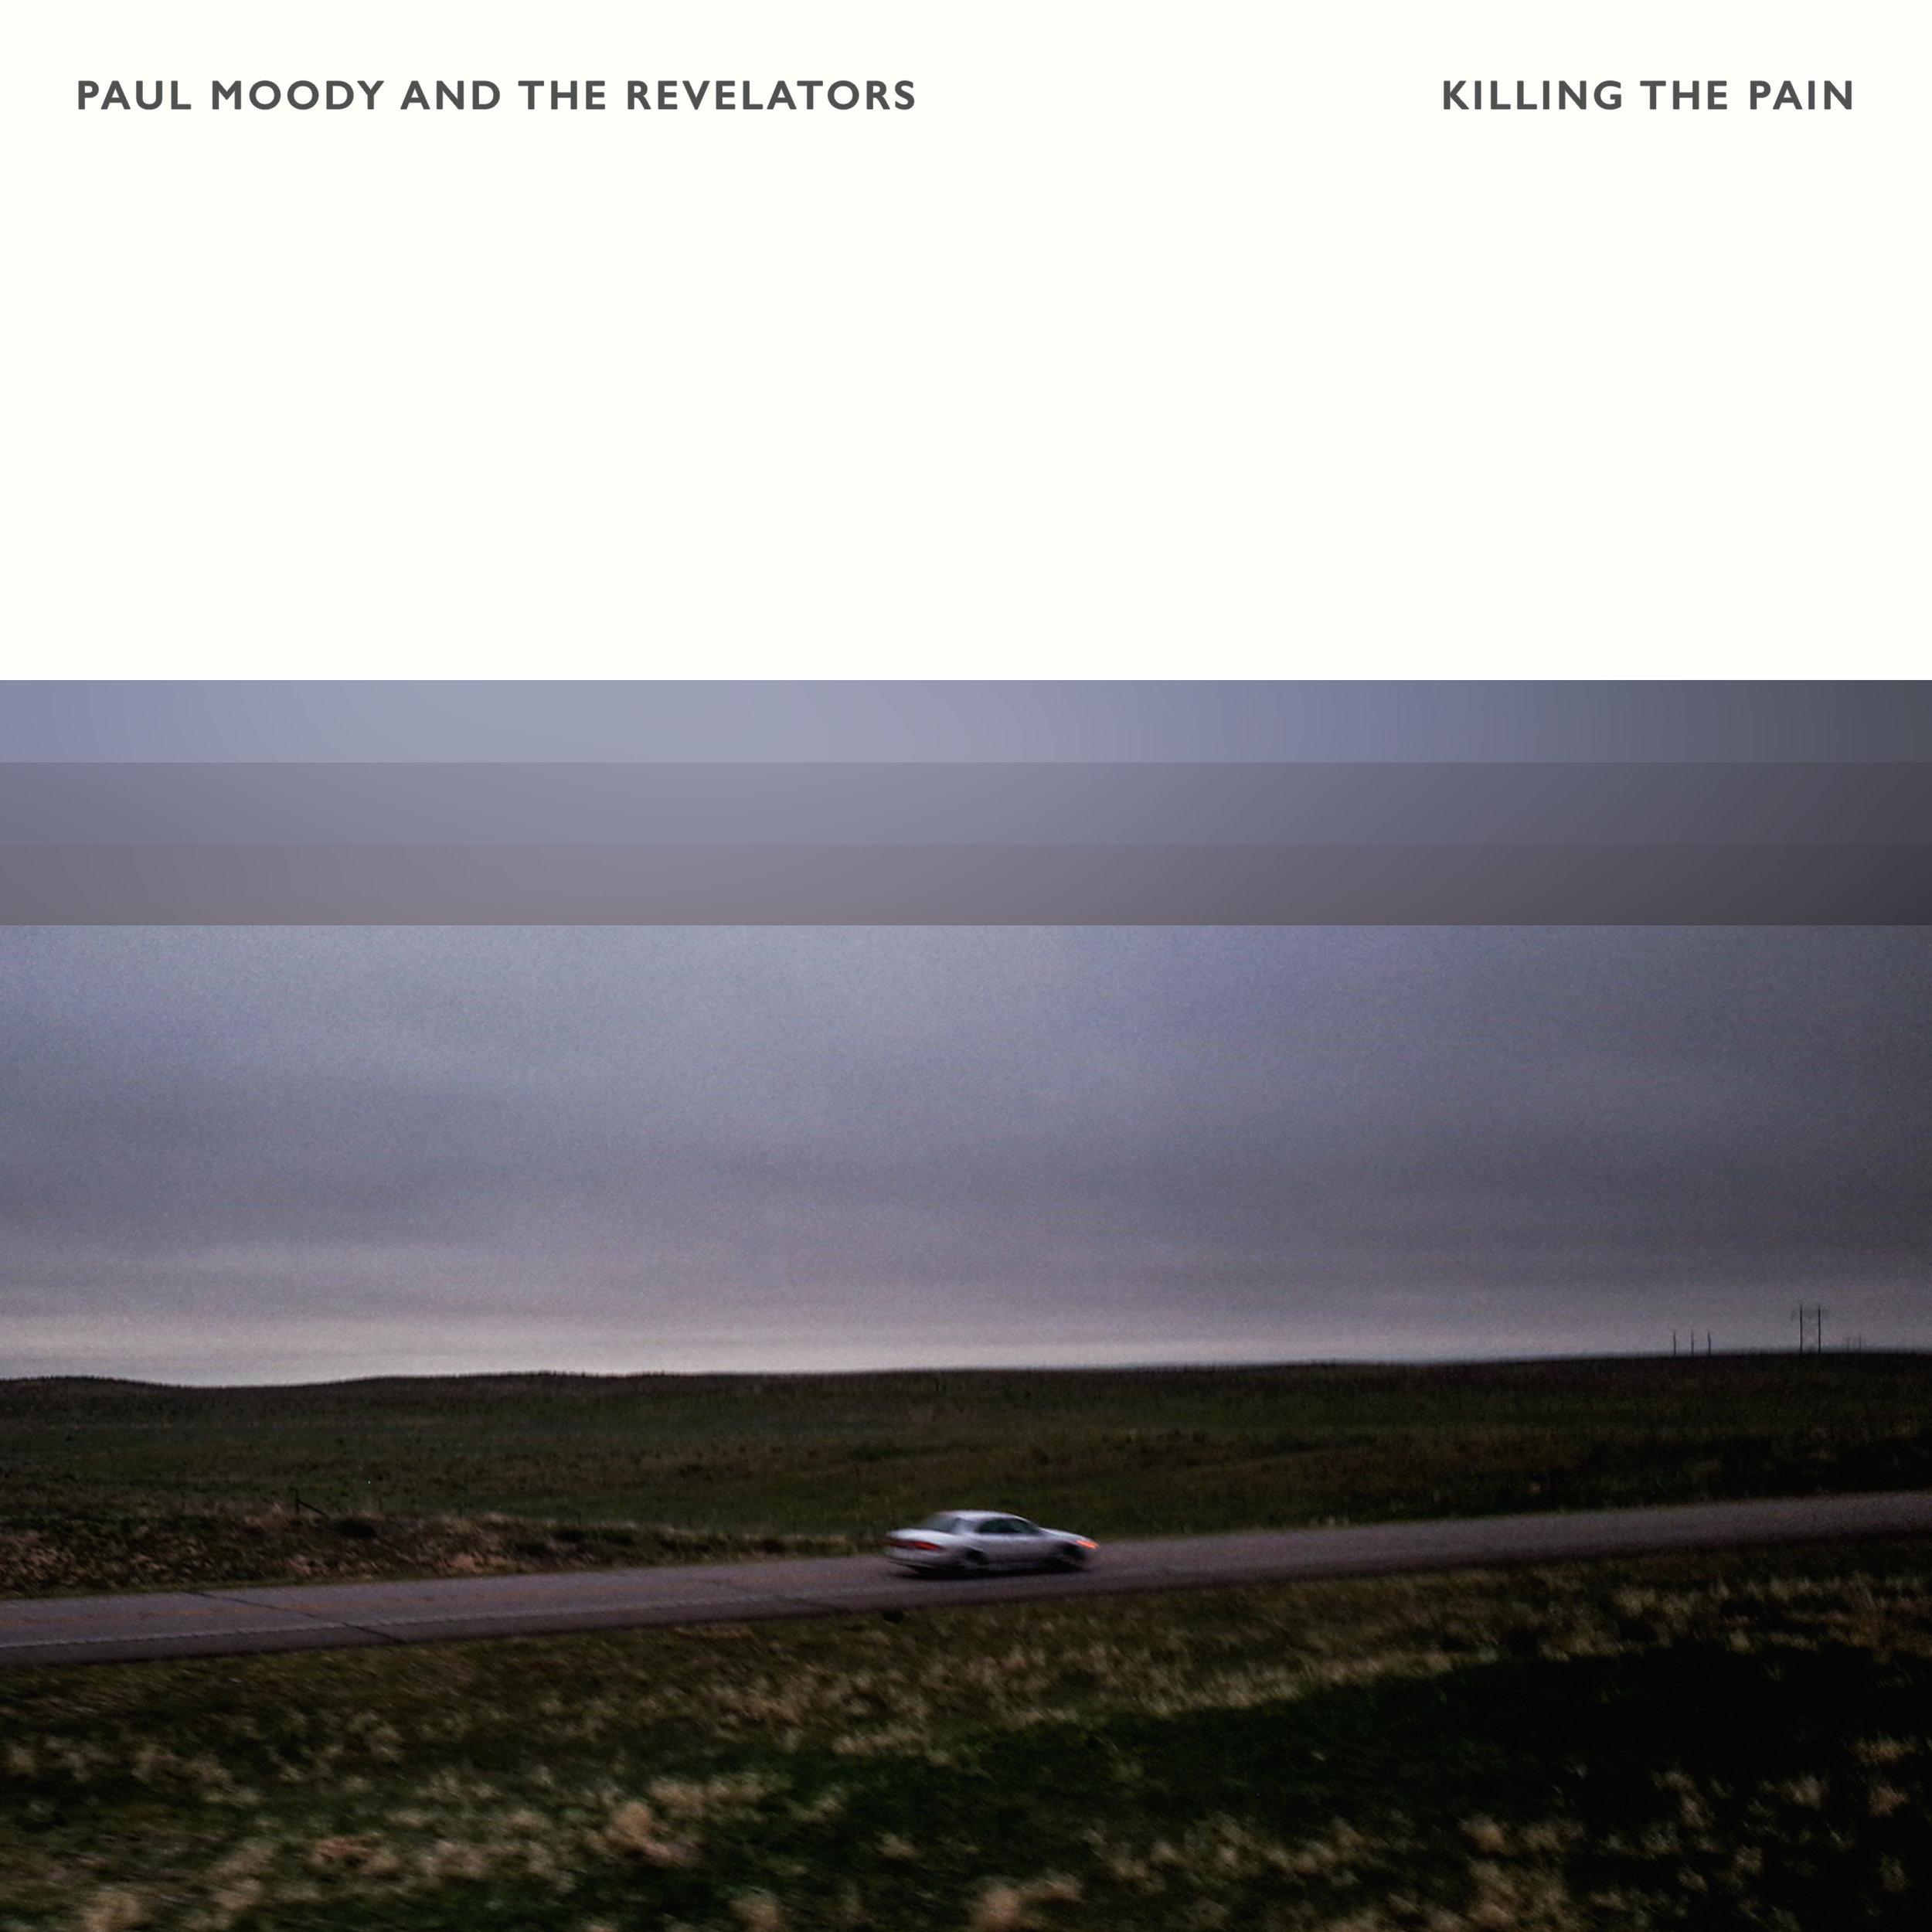 Paul Moody and the Revelators - Killing the Pain